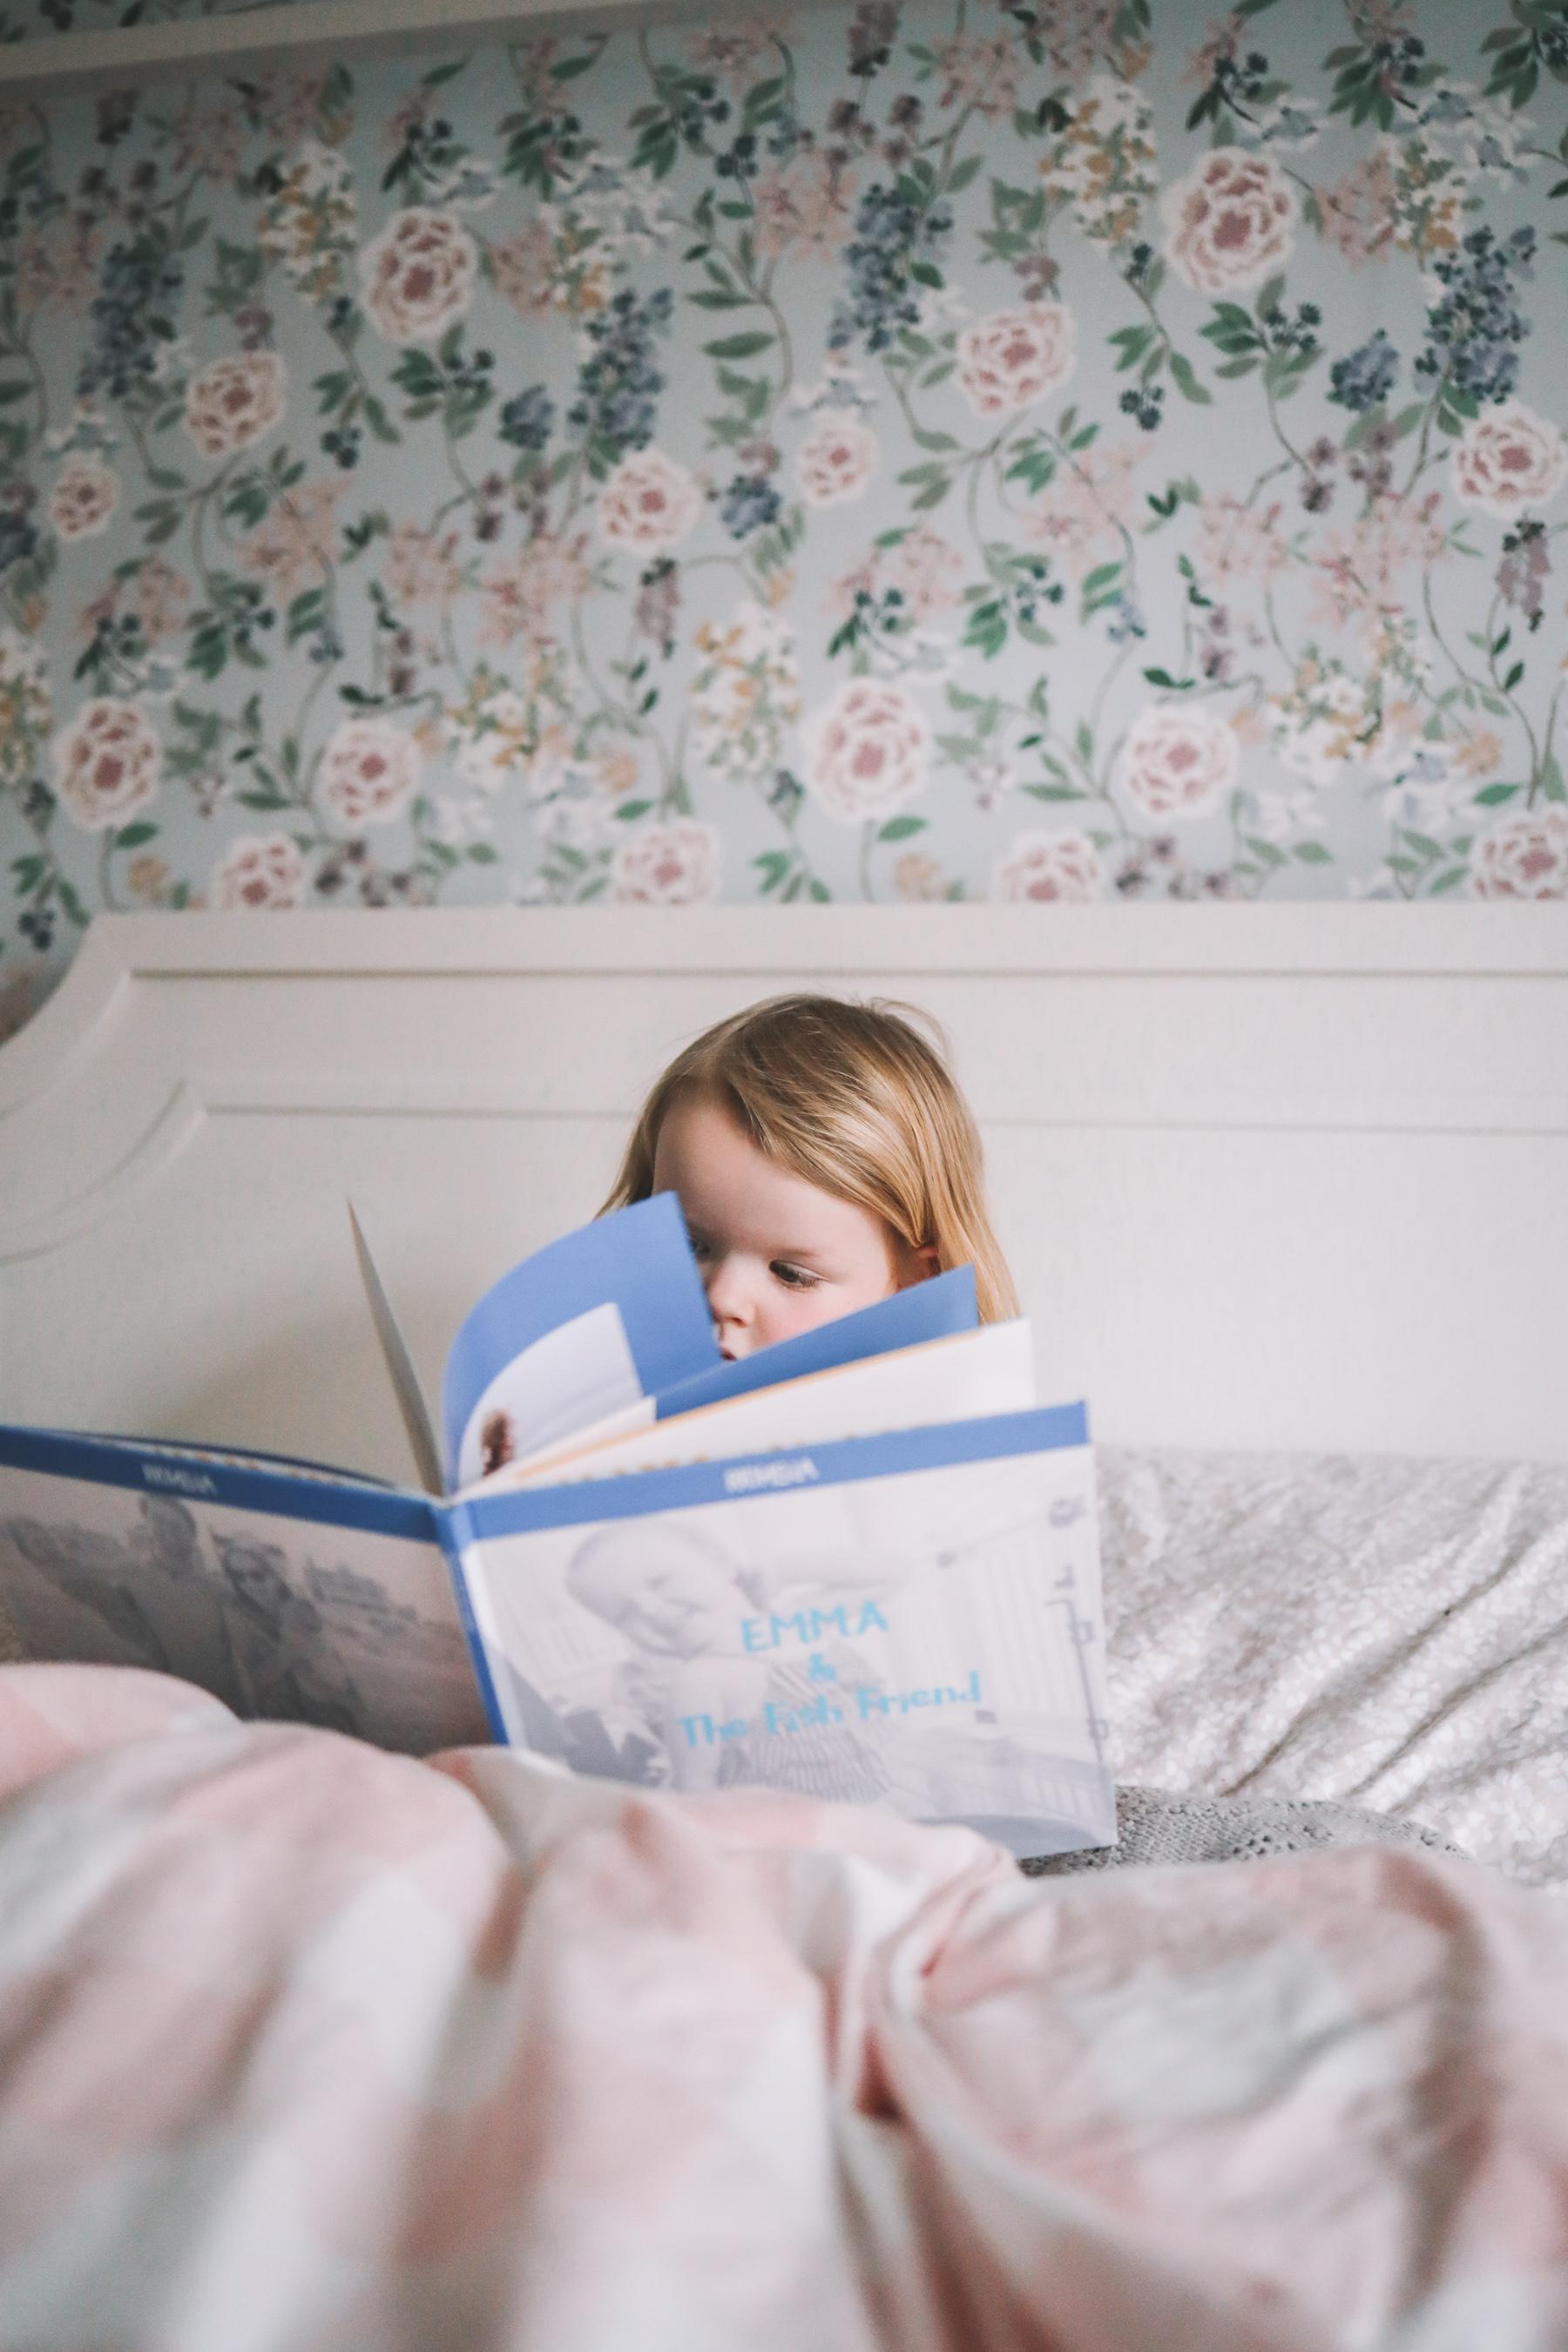 Rhymella Personalized Children's Books